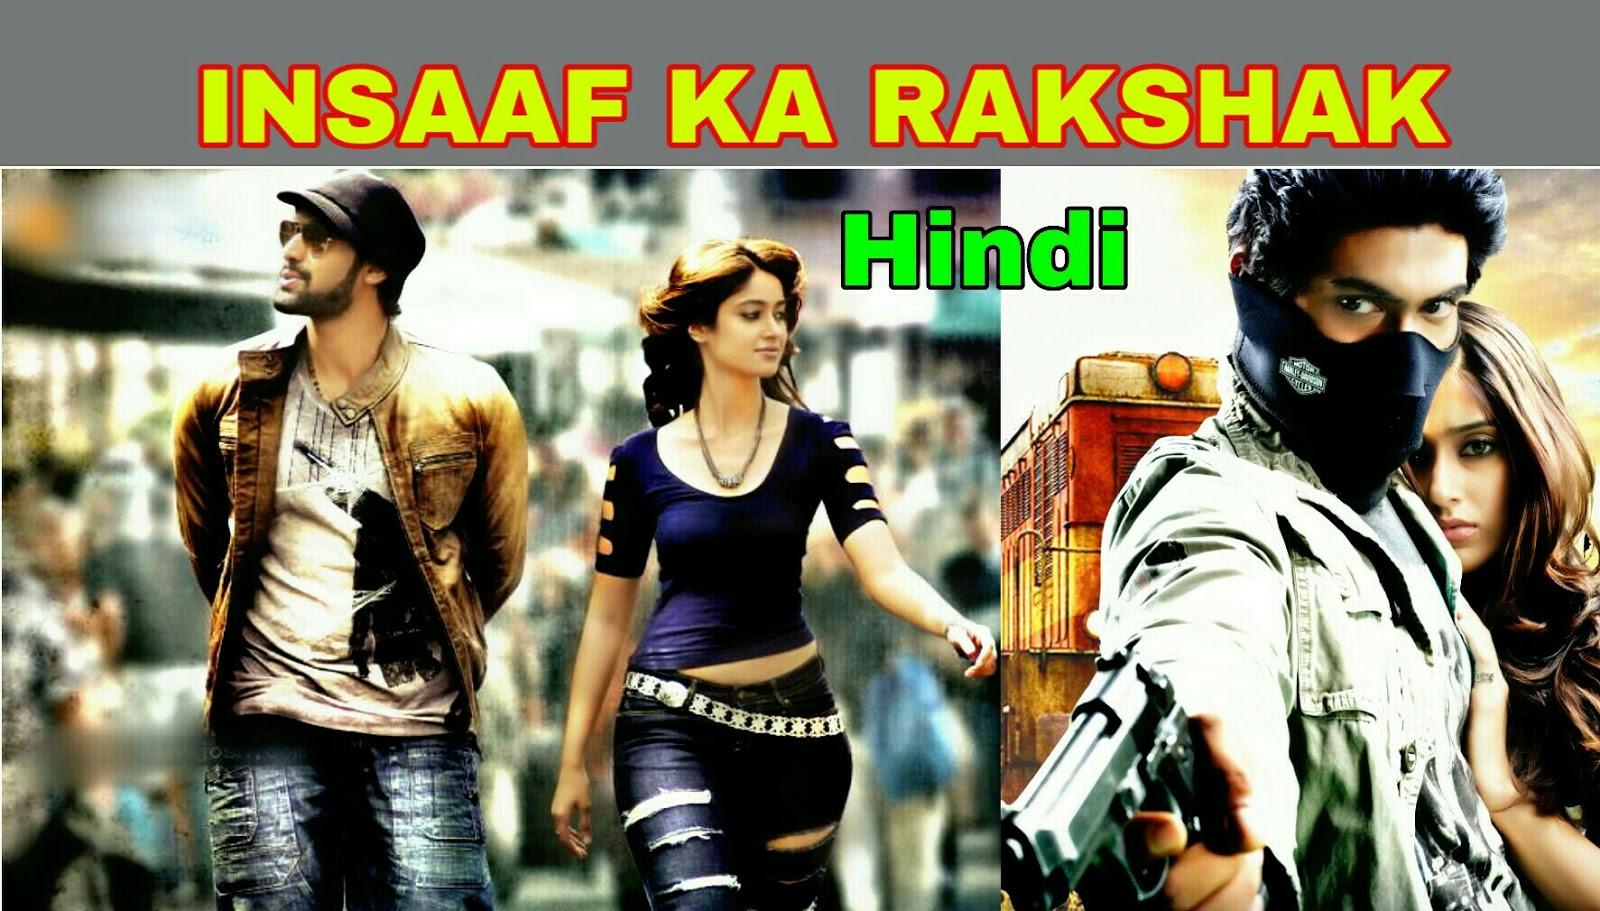 Insaaf Ka Rakshak Hindi Dubbed Movie download filmywap